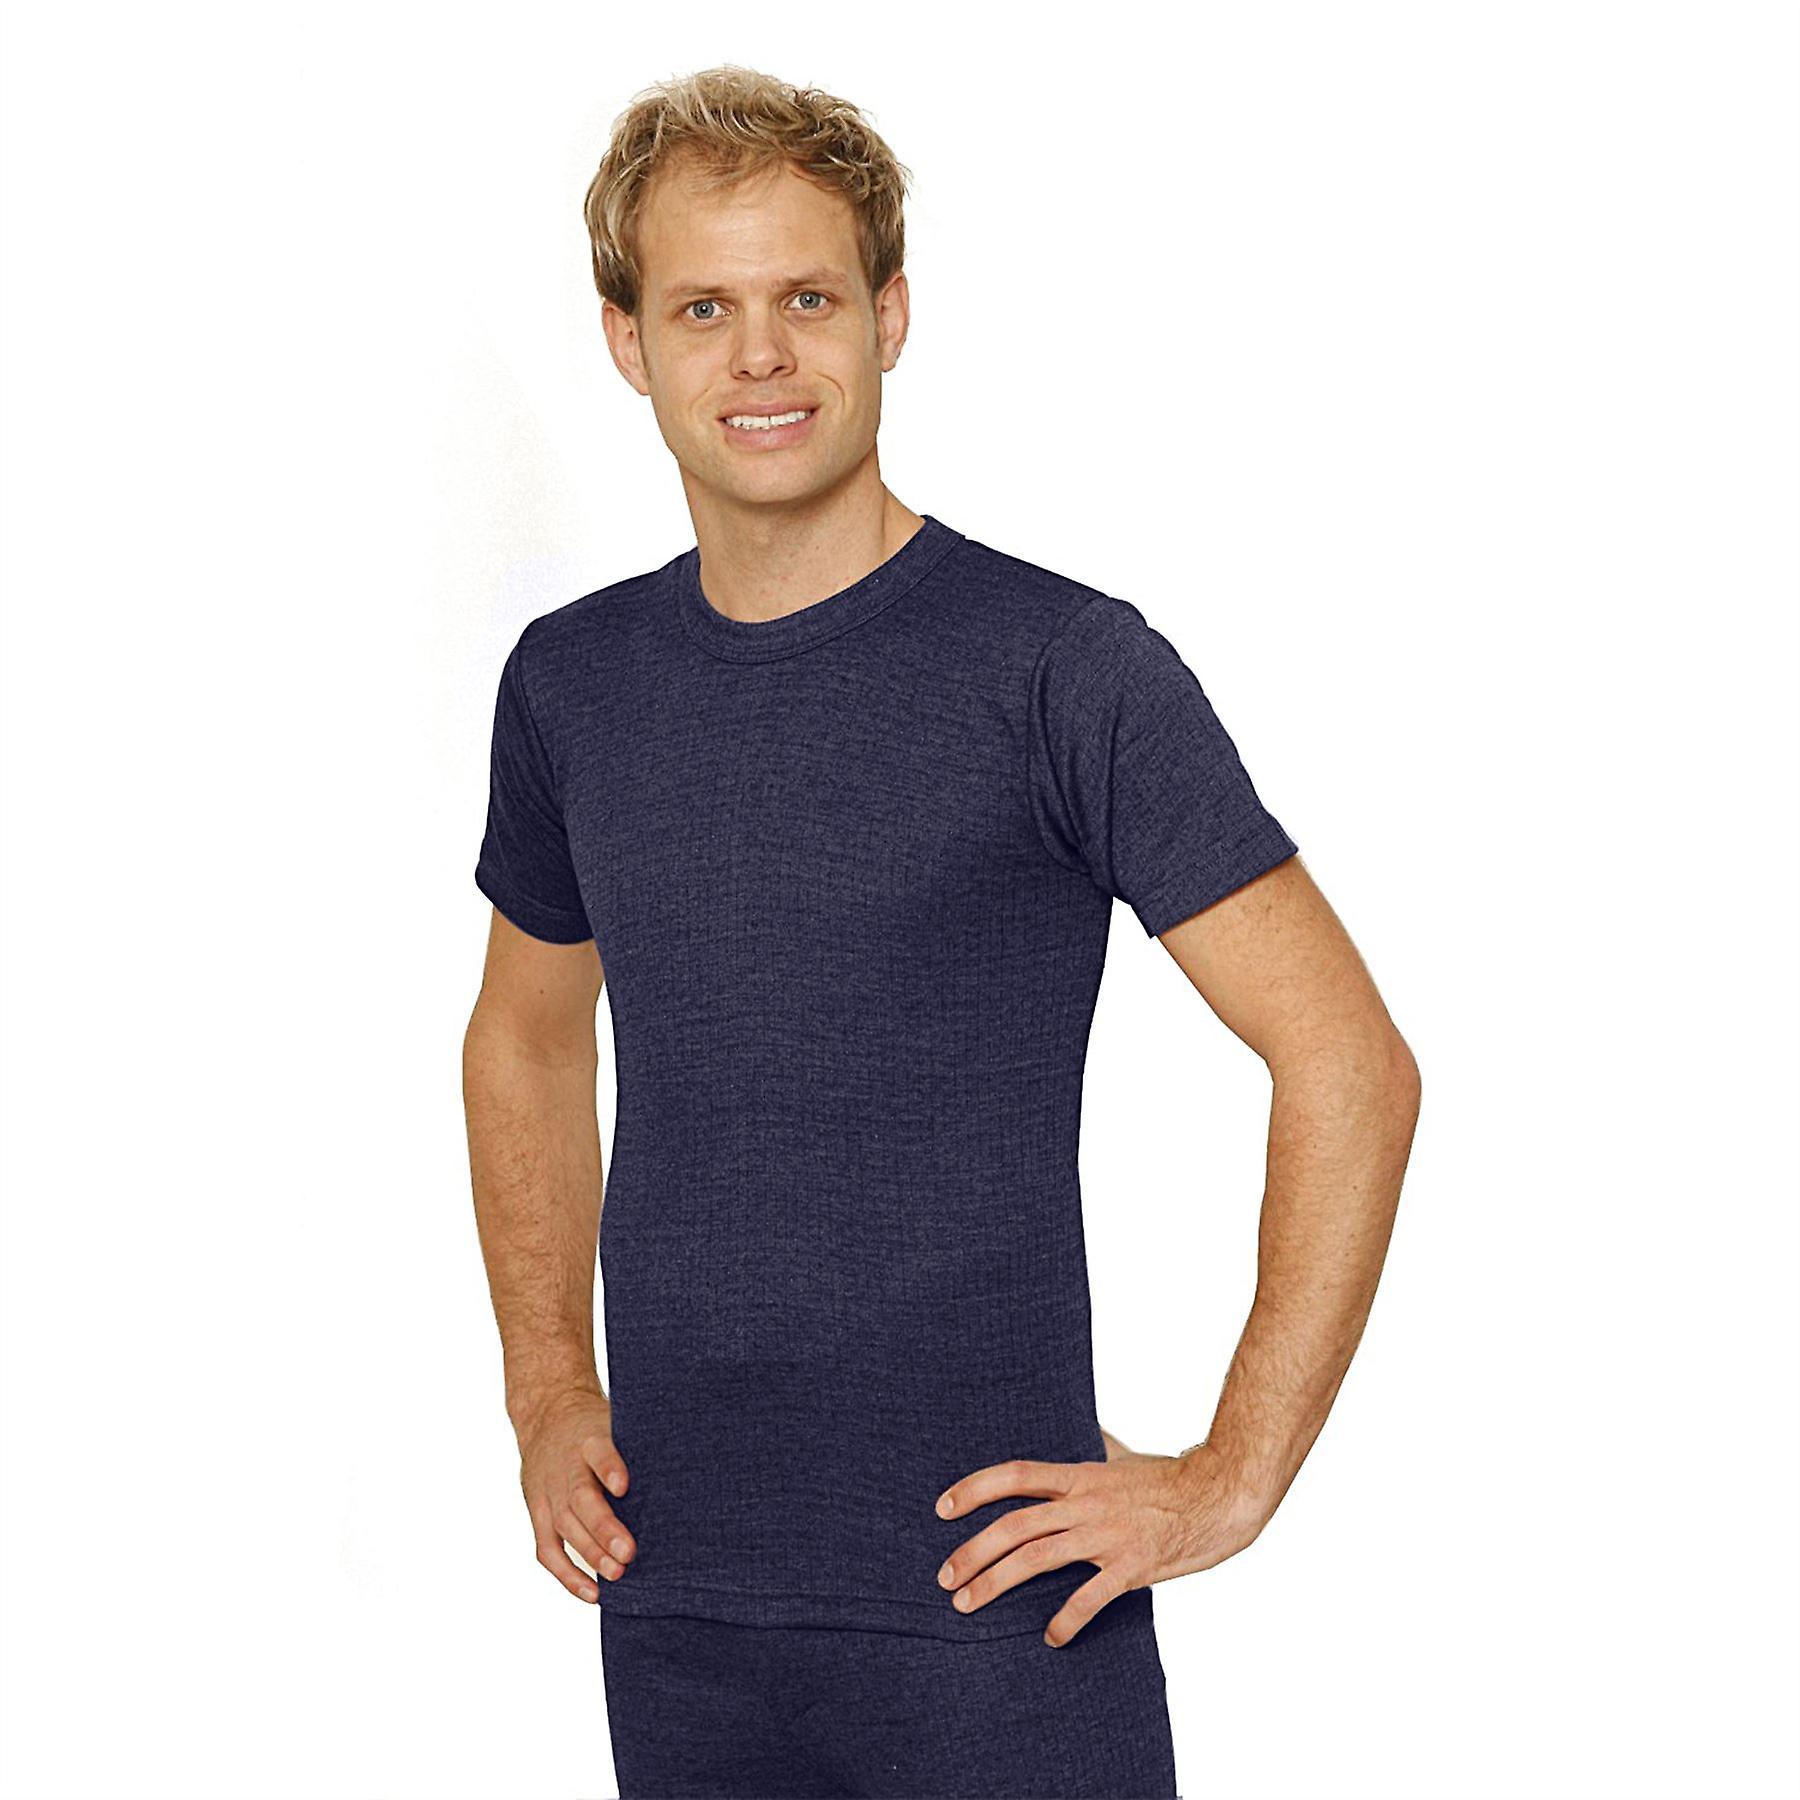 OCTAVE Mens Thermal Underwear Short Sleeve T-Shirt / Vest / Top